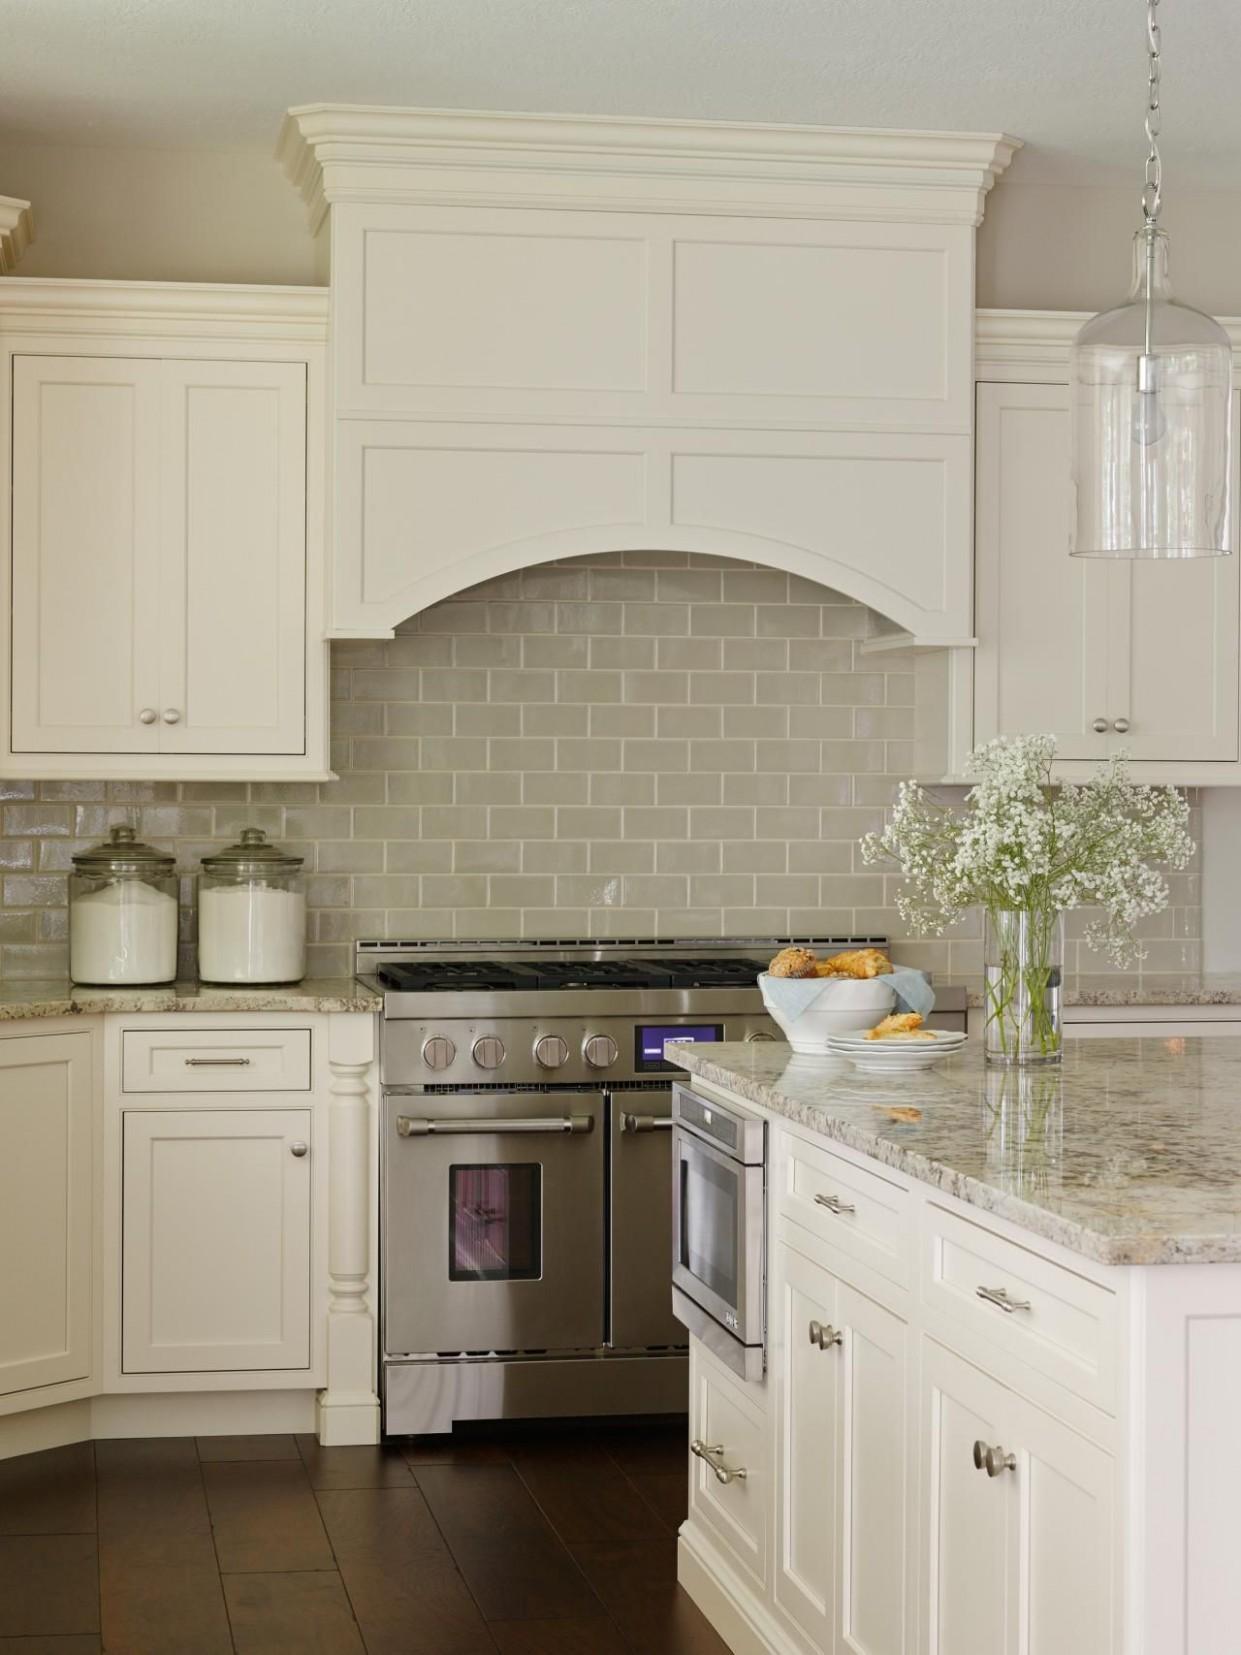 Best Kitchen  Home kitchens, Kitchen remodel, Kitchen inspirations - Kitchen Designs With Off White Cabinets